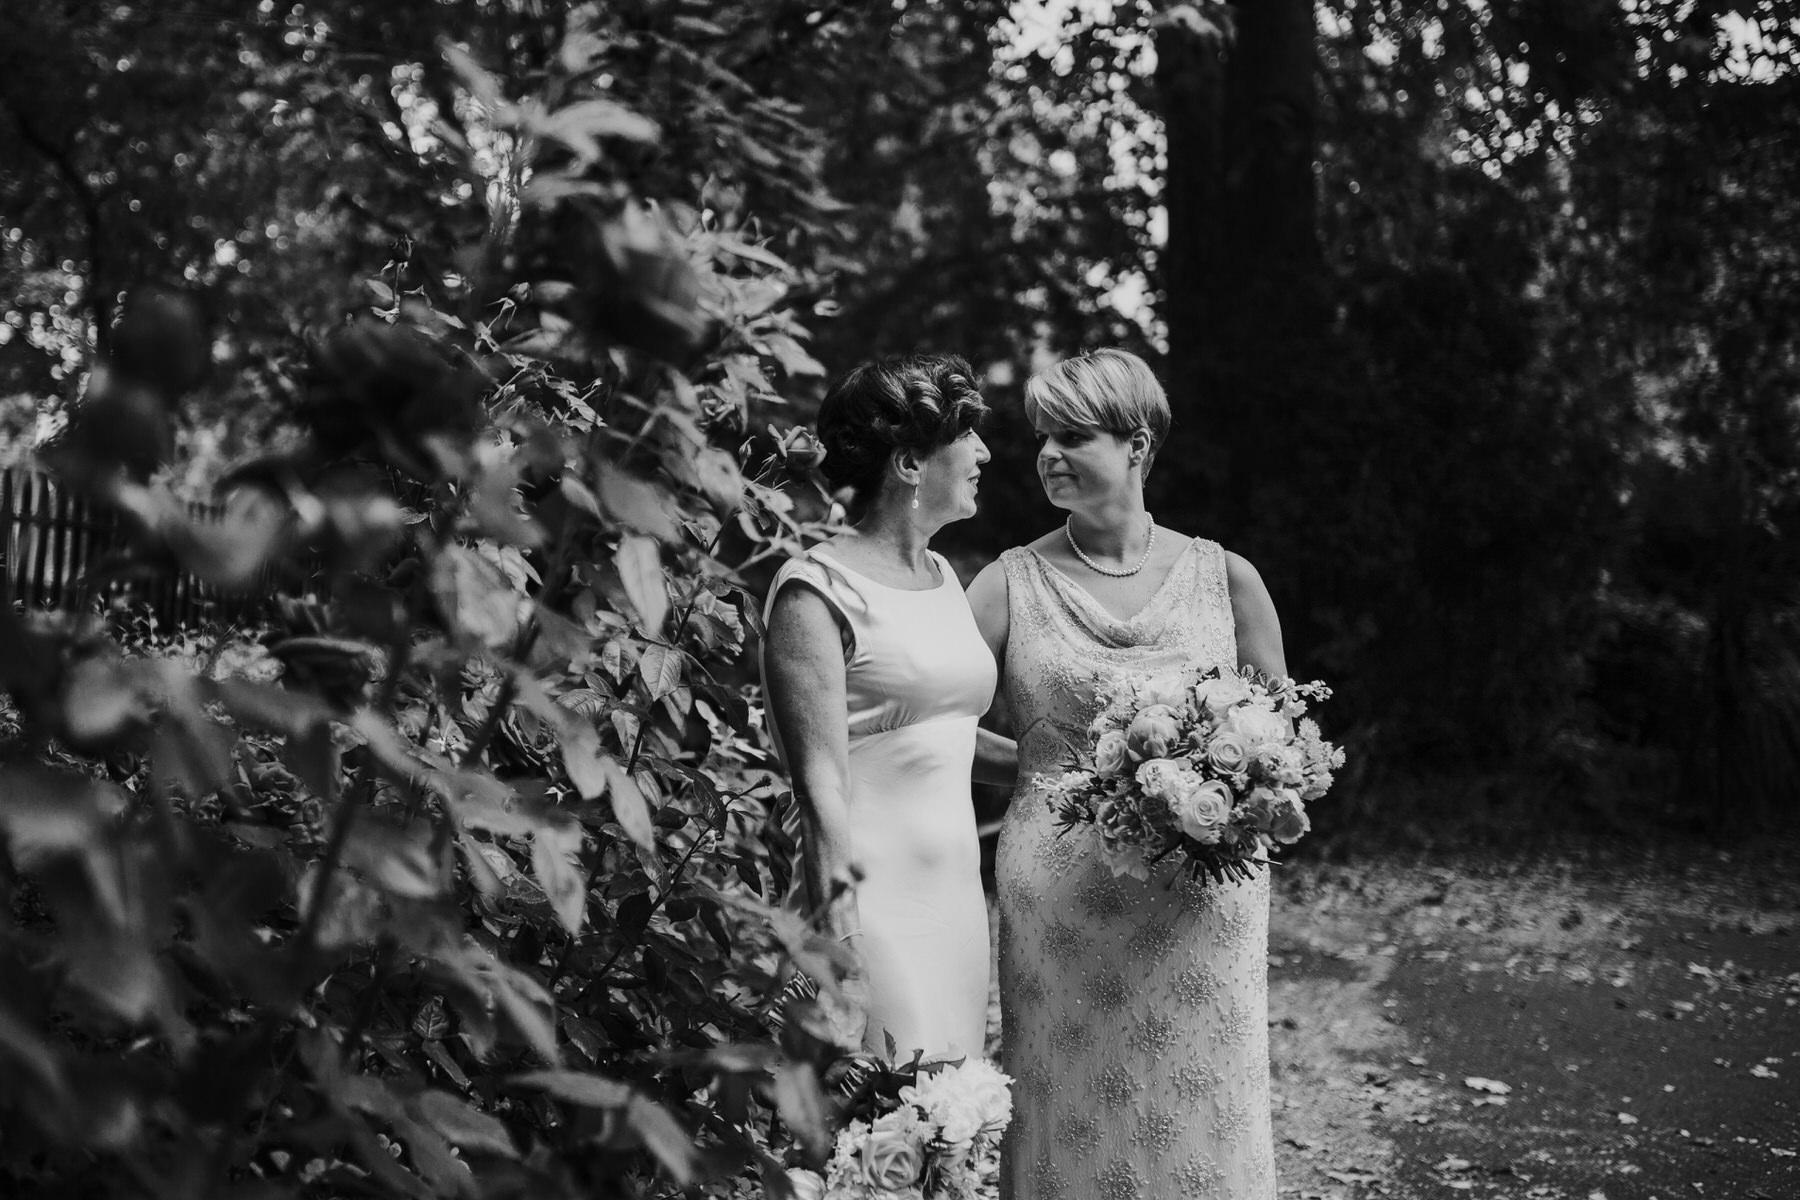 192 BW two brides couple portraits Yolande De Vries Photography.jpg